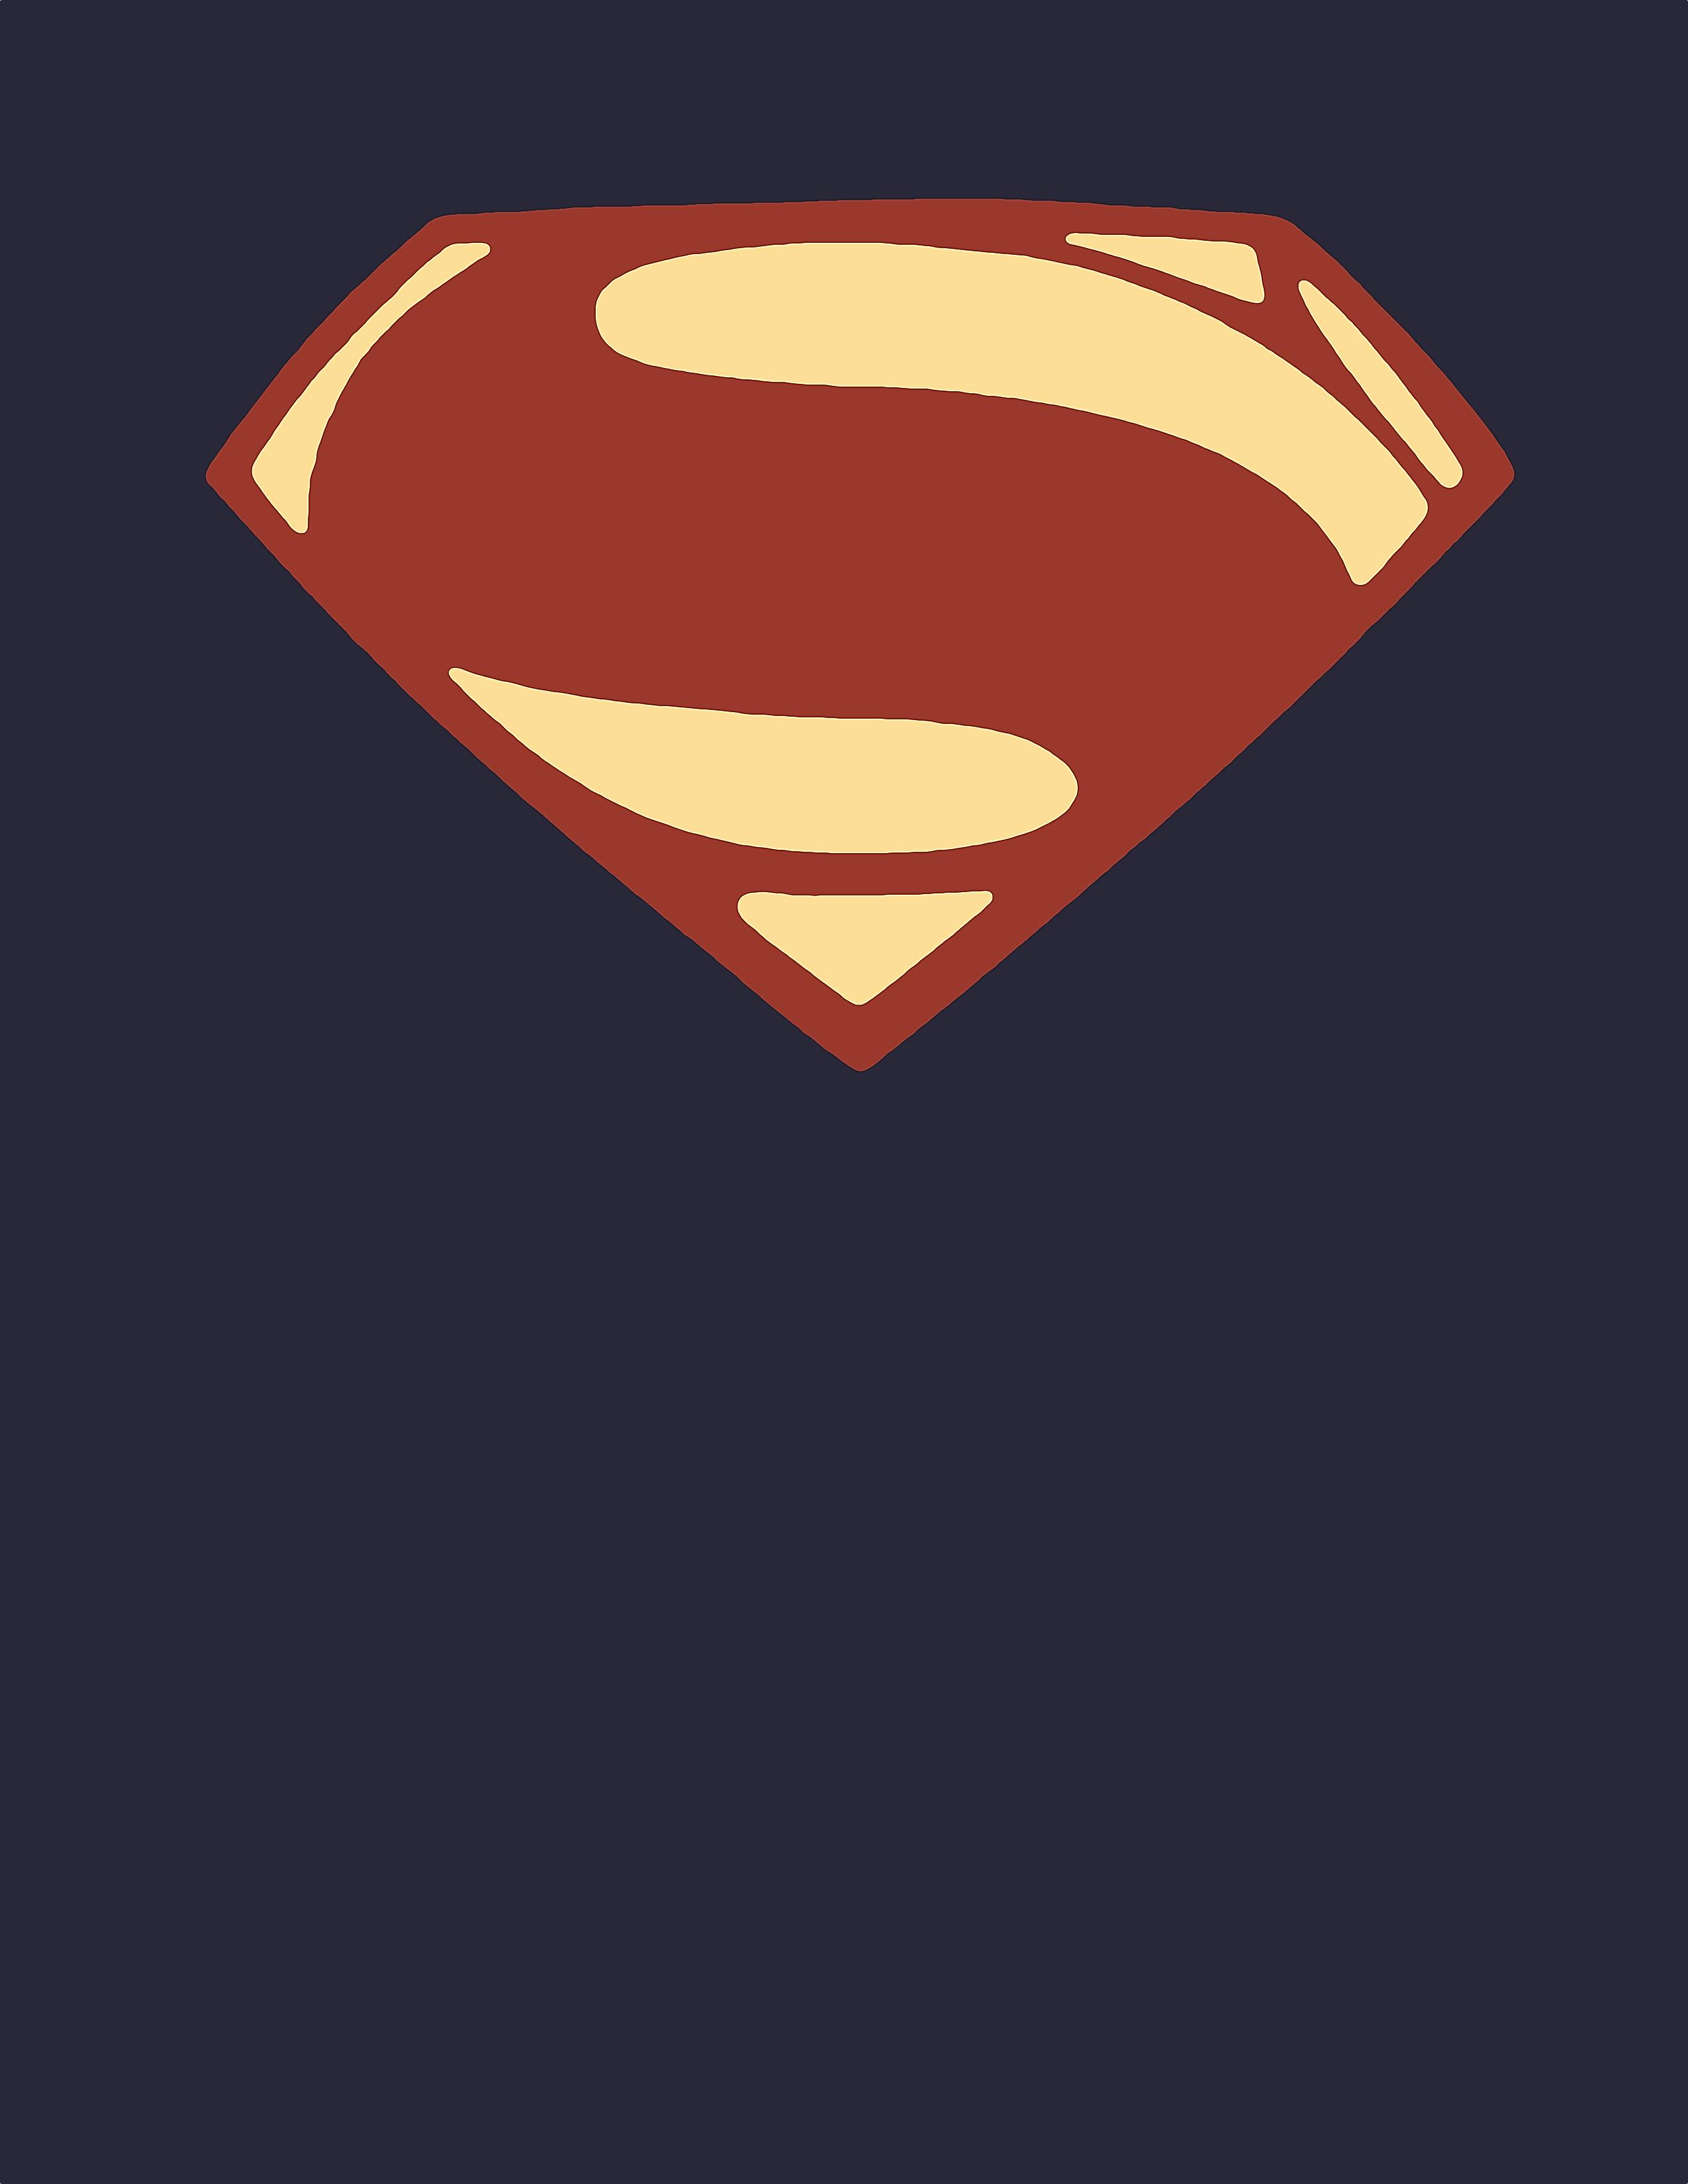 hope superman symbol